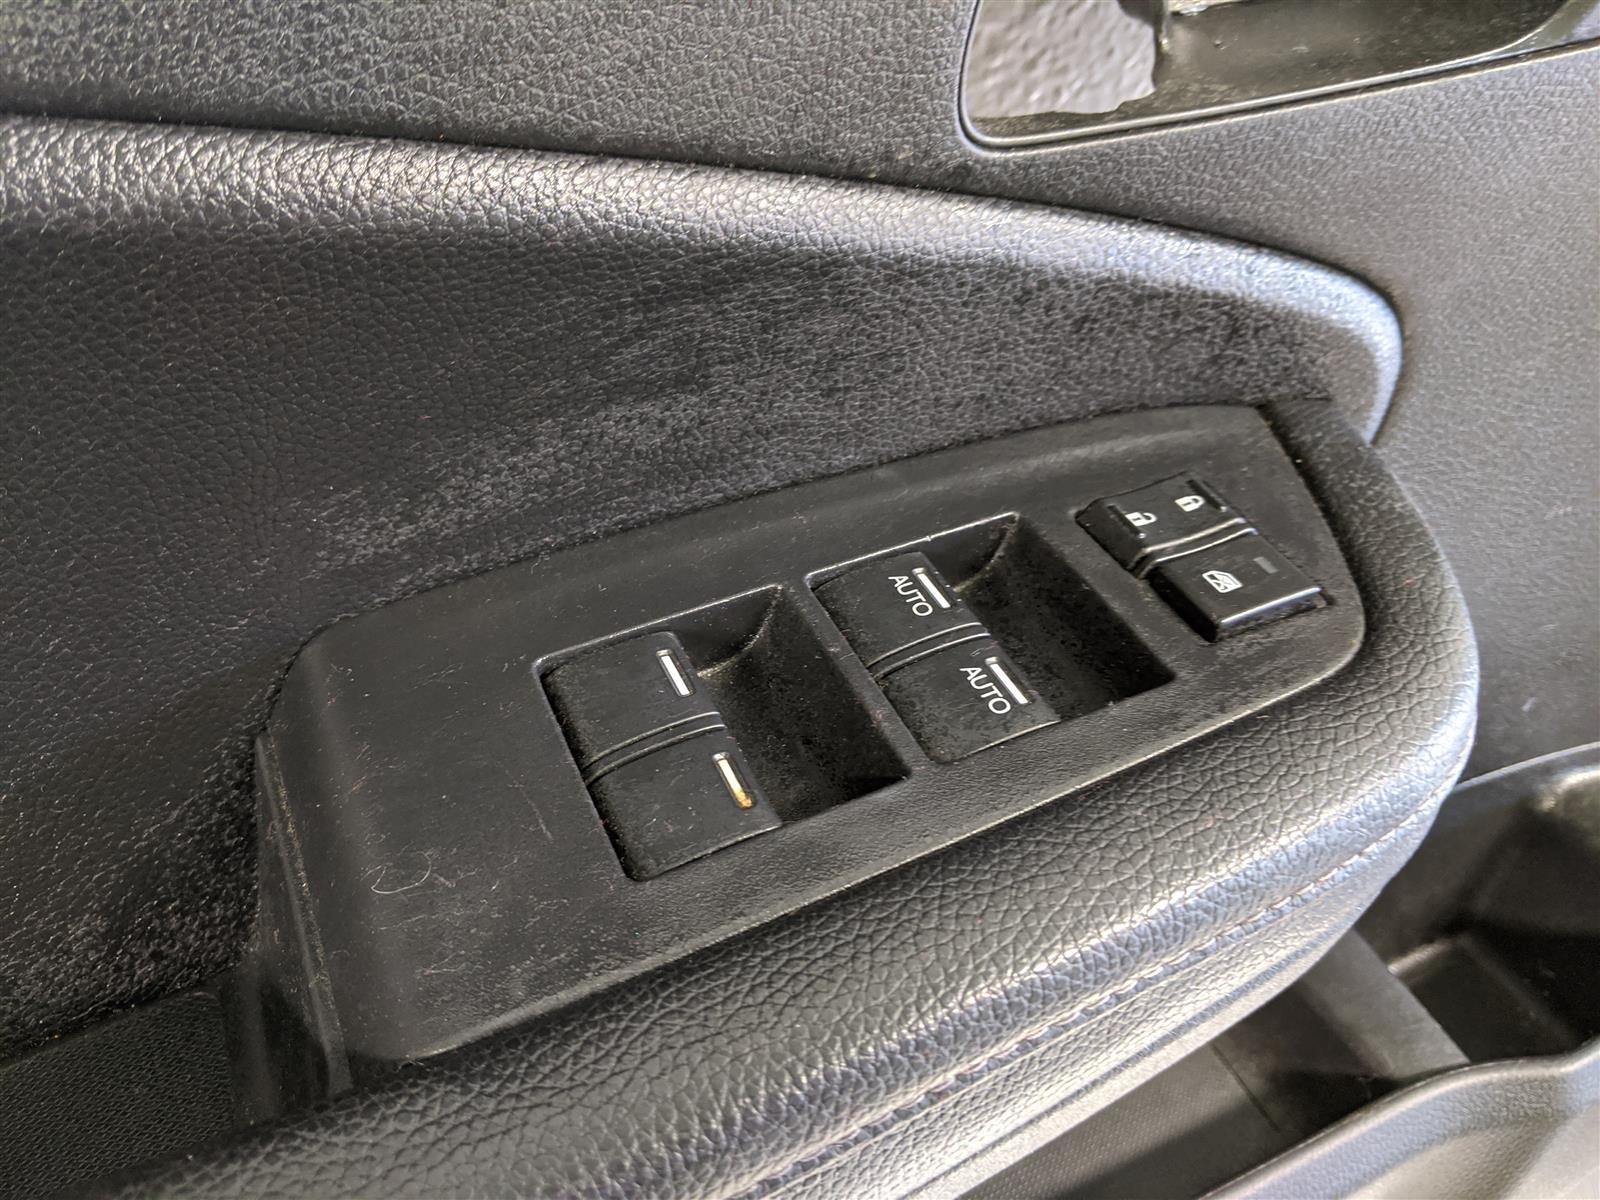 2017 Honda Ridgeline Master Window Switch Replacement